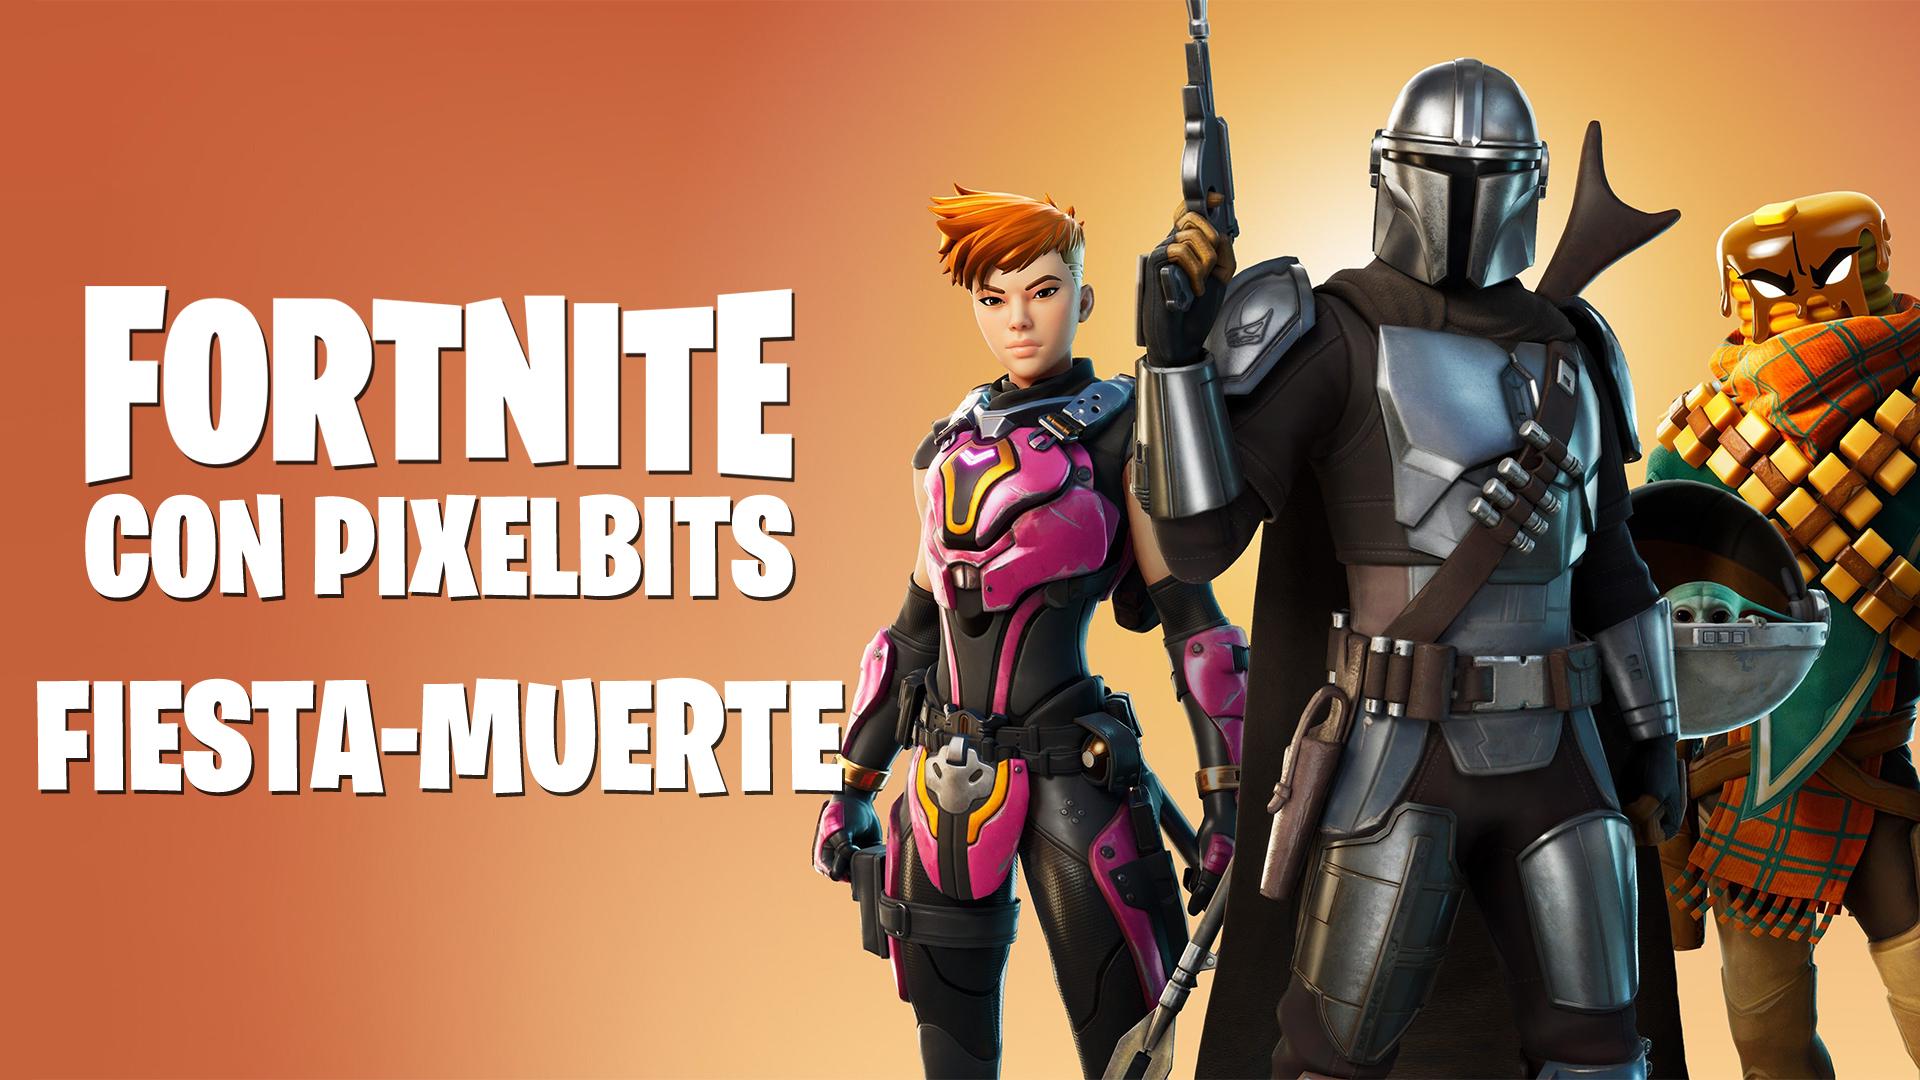 Fortnite con Pixelbits – Fiesta-Muerte